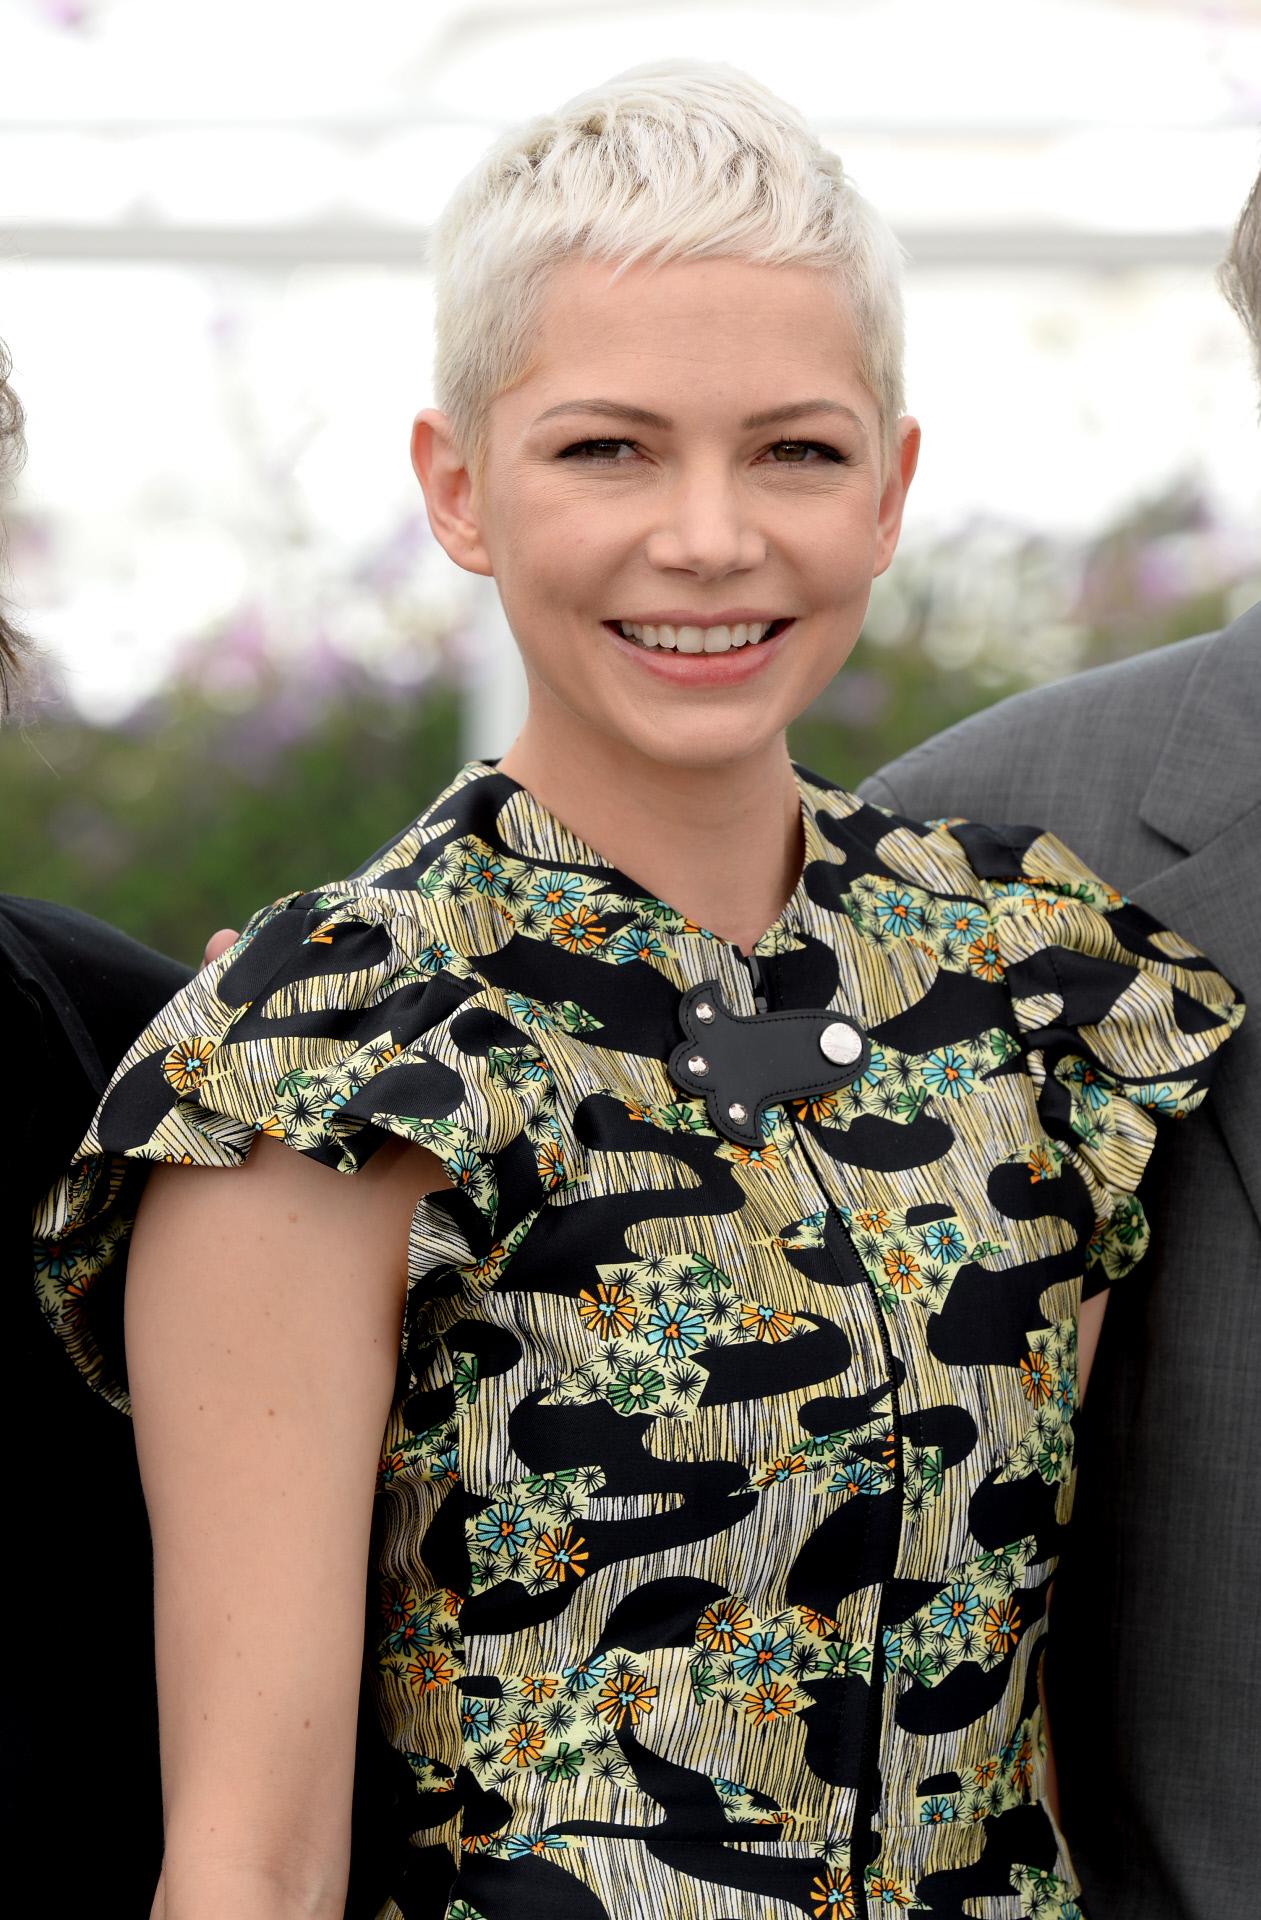 Michelle Williams con un corte de pelo pixie muy femenino y de tendencia rubio platino.